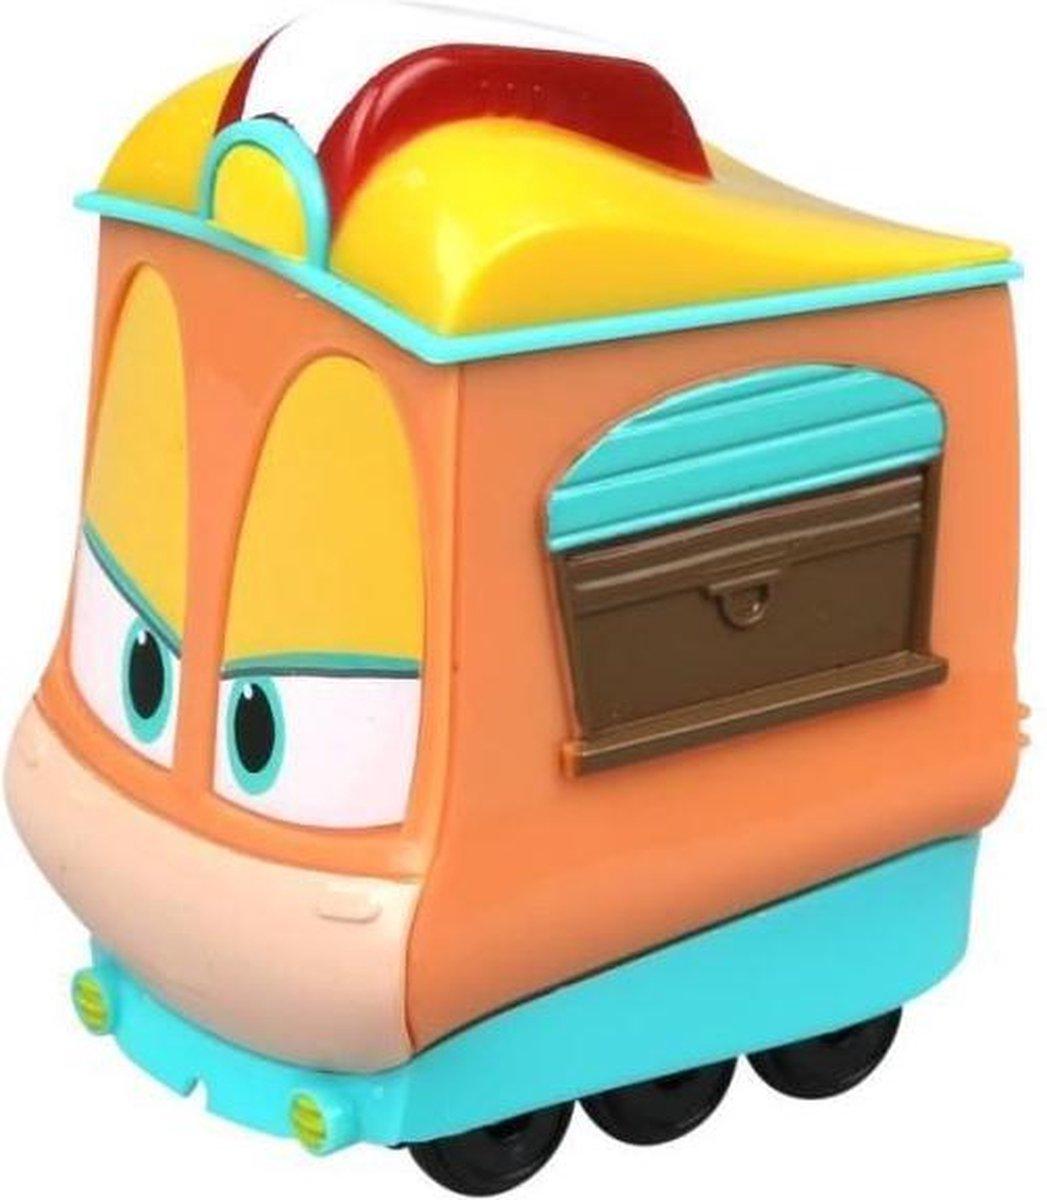 ROBOT-TREINEN - Mini-voertuig - Jeanne